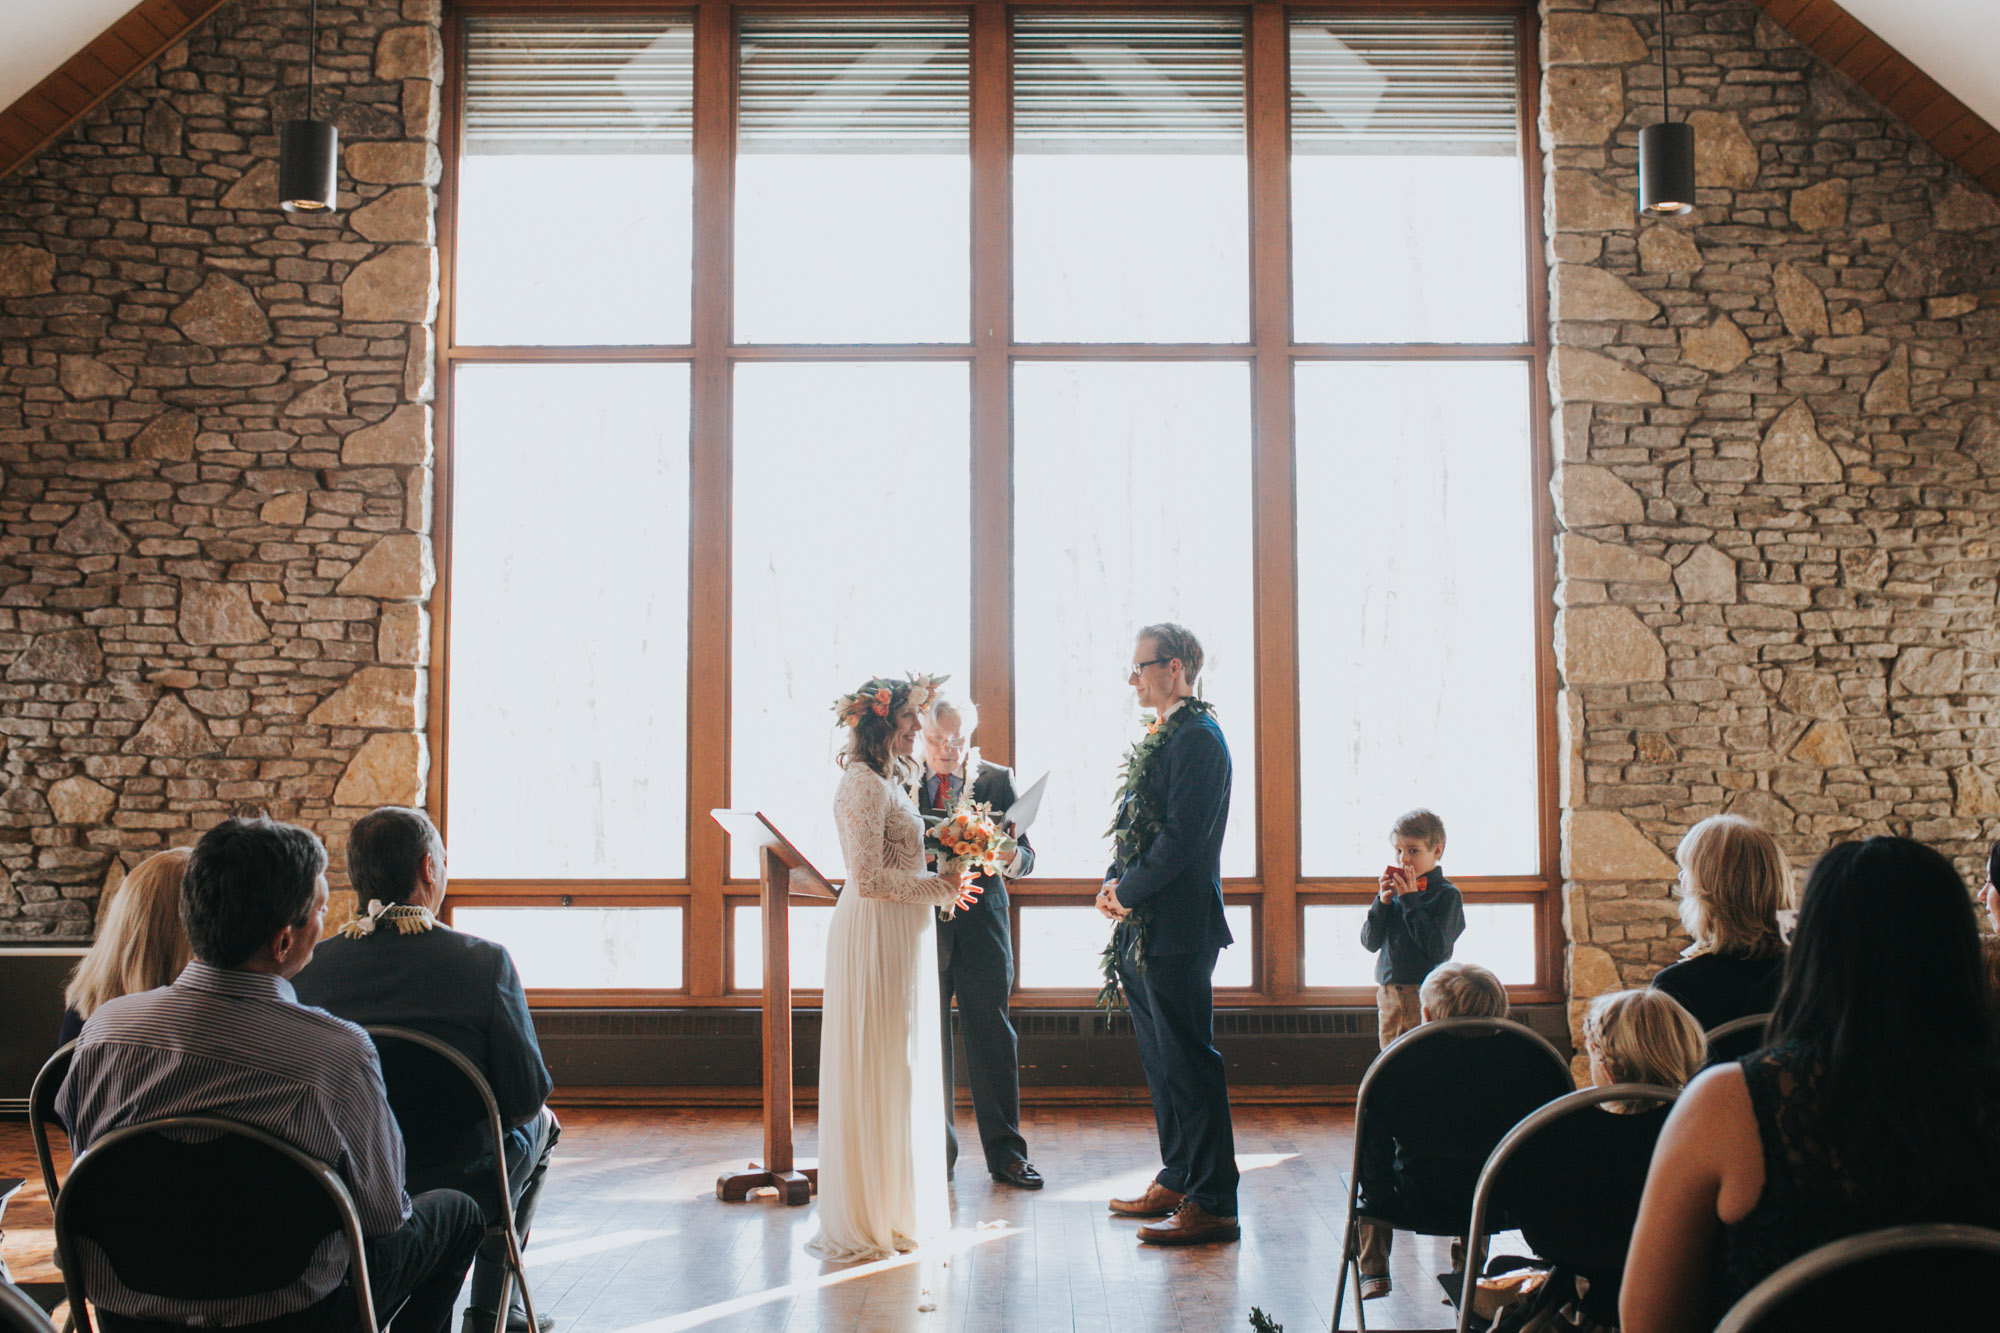 oak-openings-lodge-wedding-6720.jpg